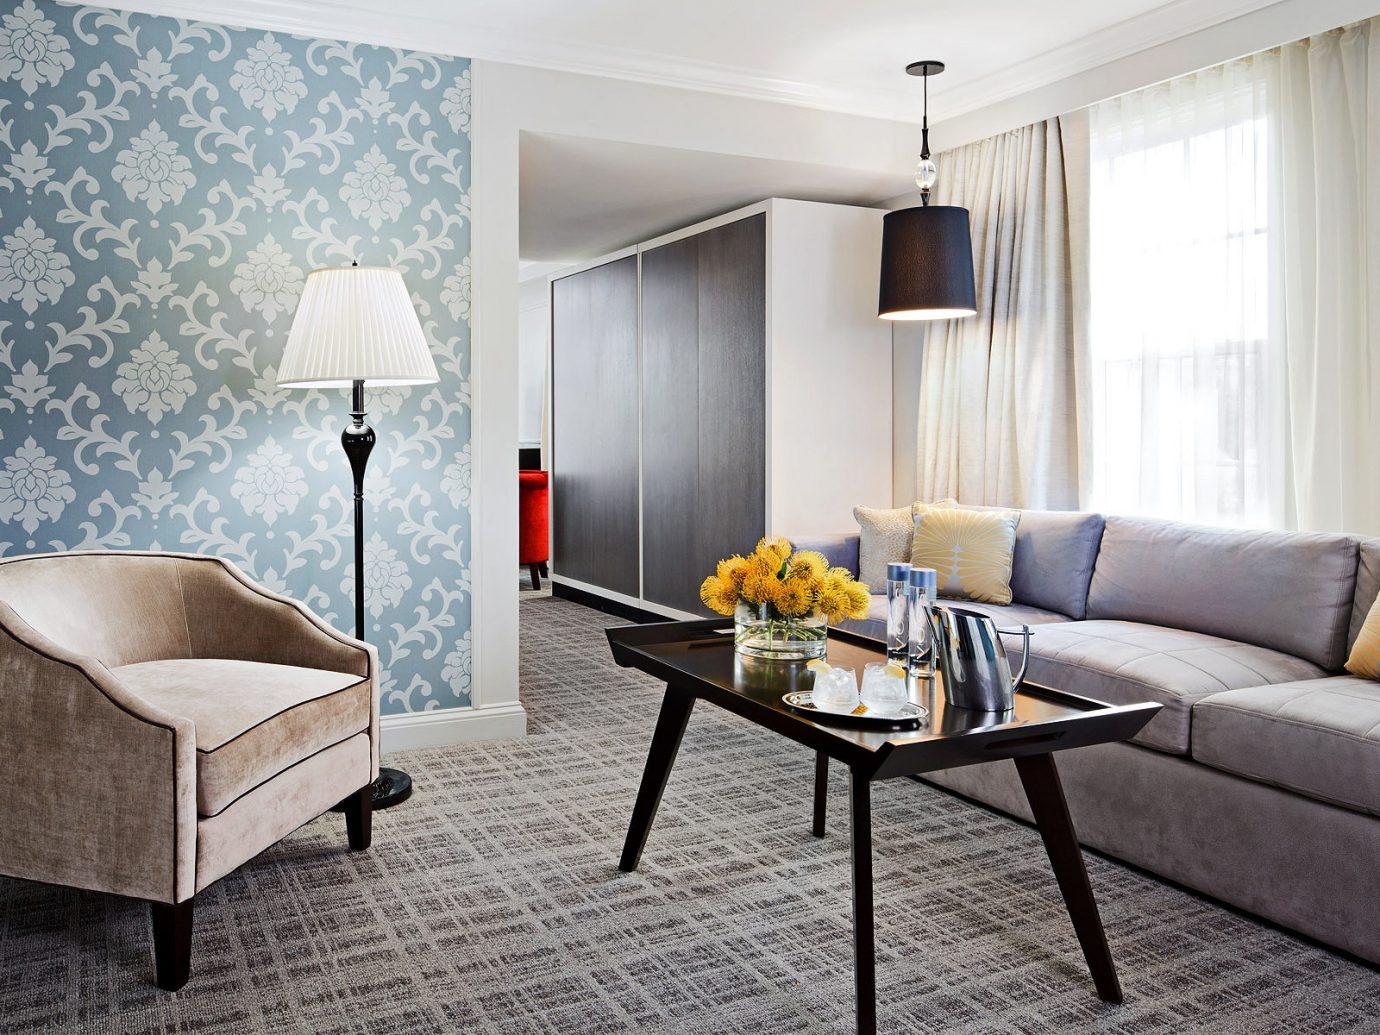 Bedroom Boutique Hotels City Hotels Living Lounge Modern indoor floor wall room property living room Suite interior design home real estate estate Design furniture condominium apartment cottage lamp